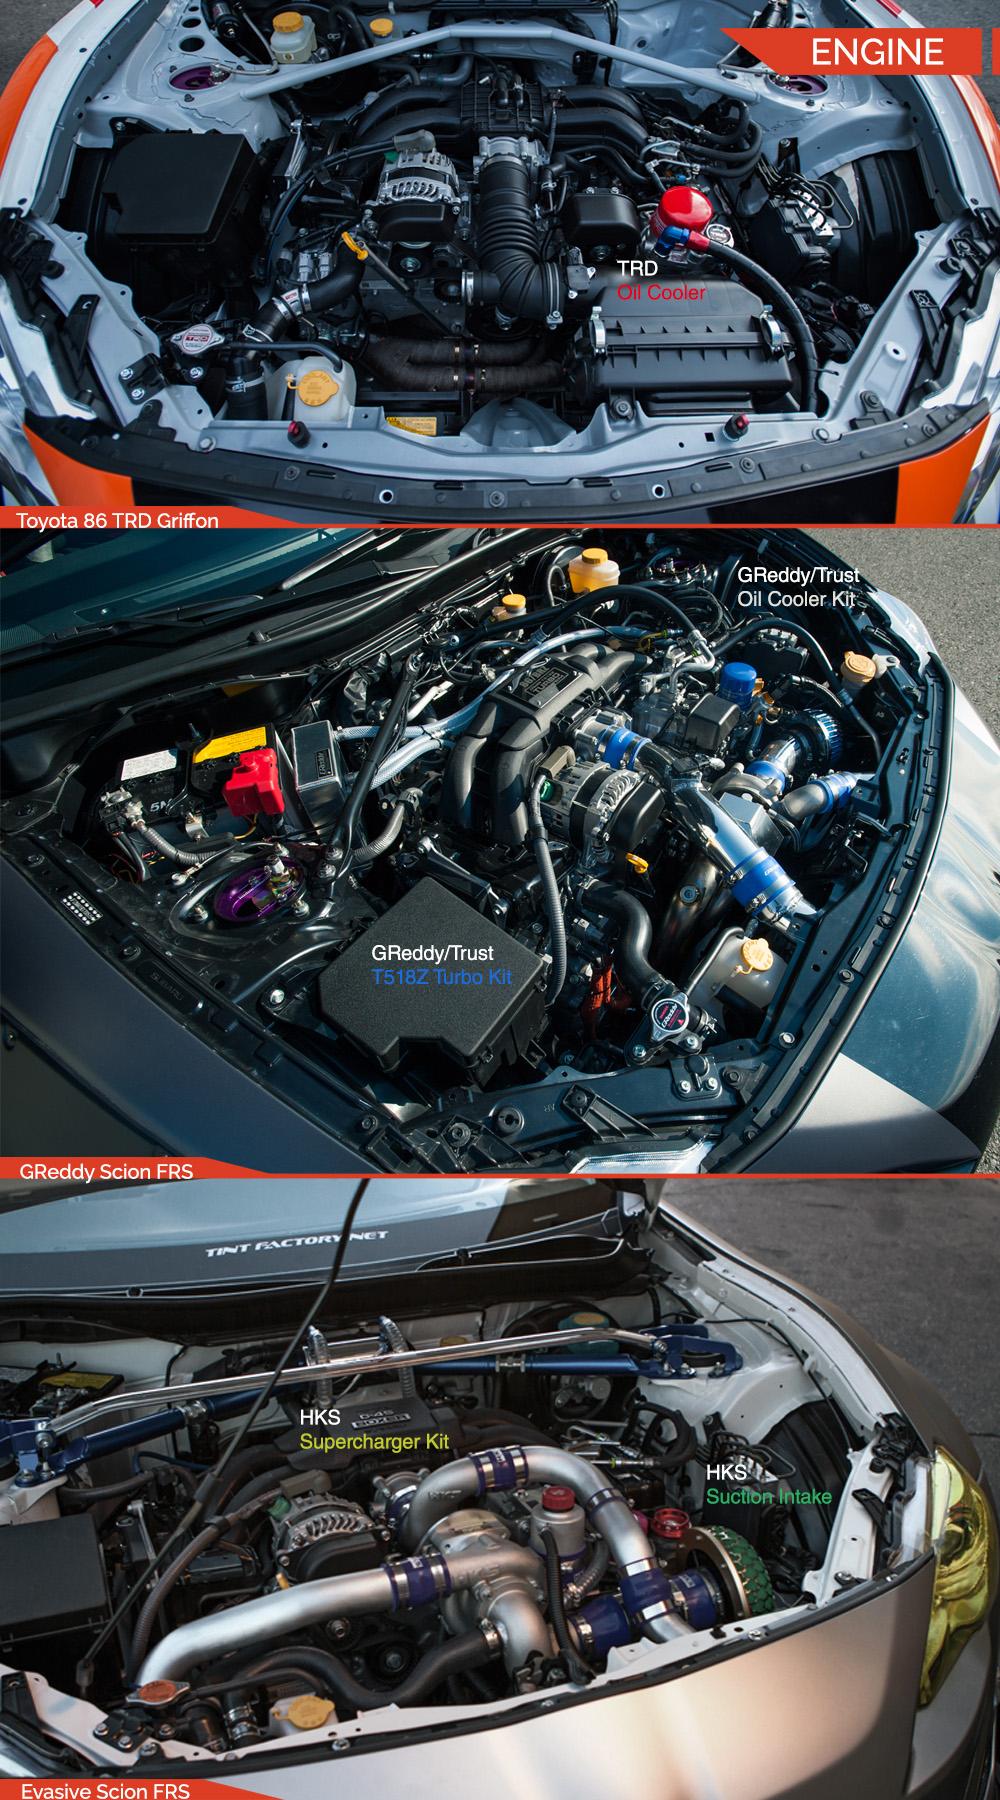 Toyota 86 scion fr s subaru brz battle royale engine